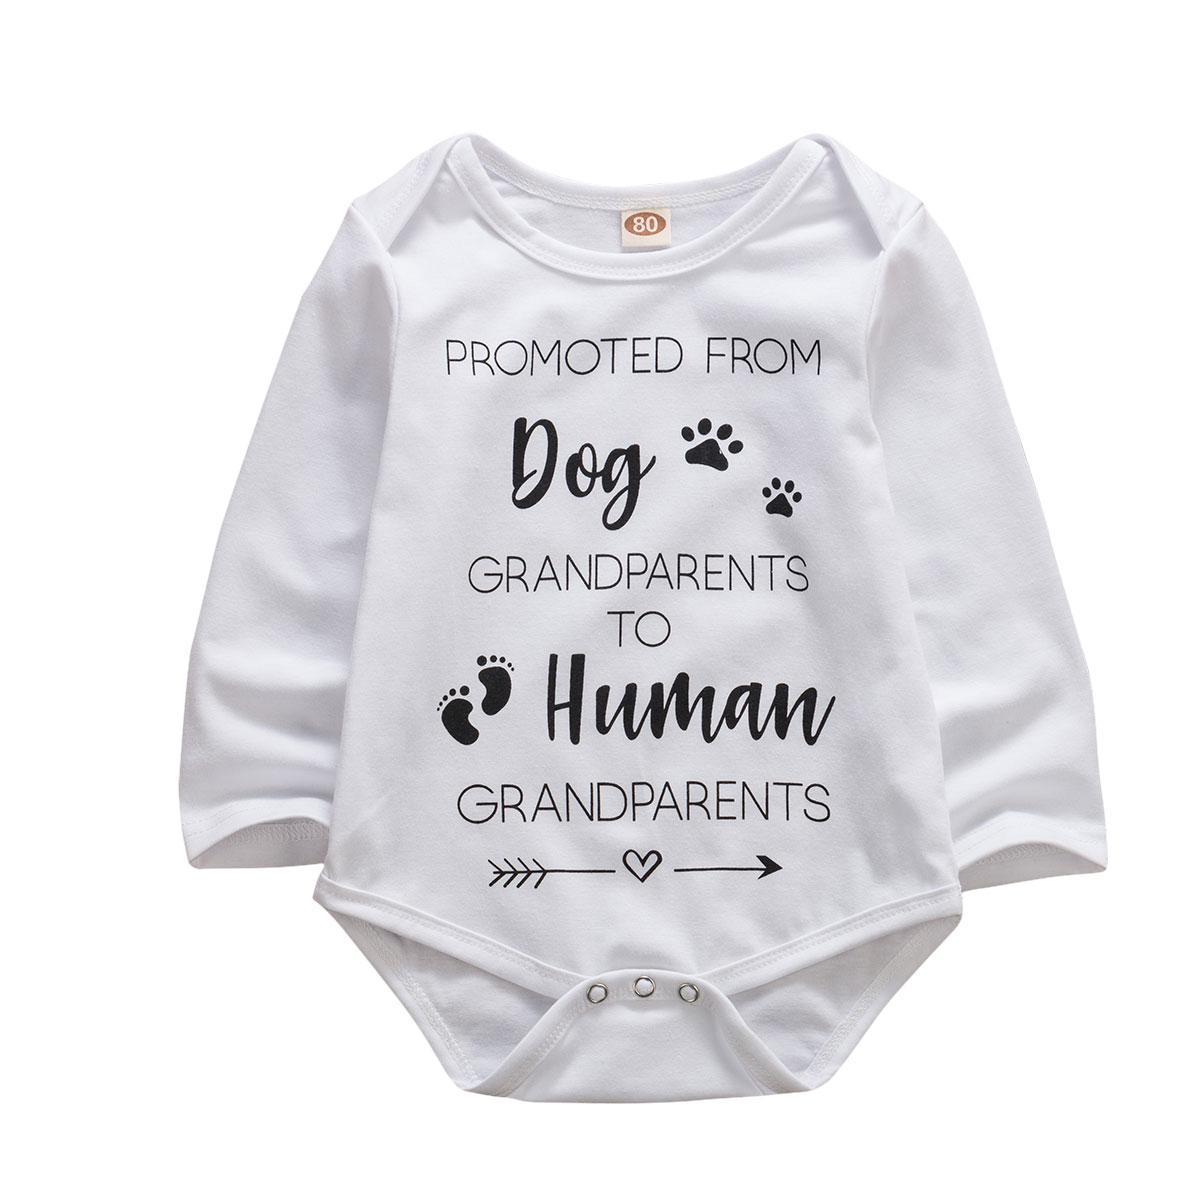 0-18M Kids Girls Crawl Suit Baby Romper Long Sleeve Jumpsuit Outfit Clothes Set